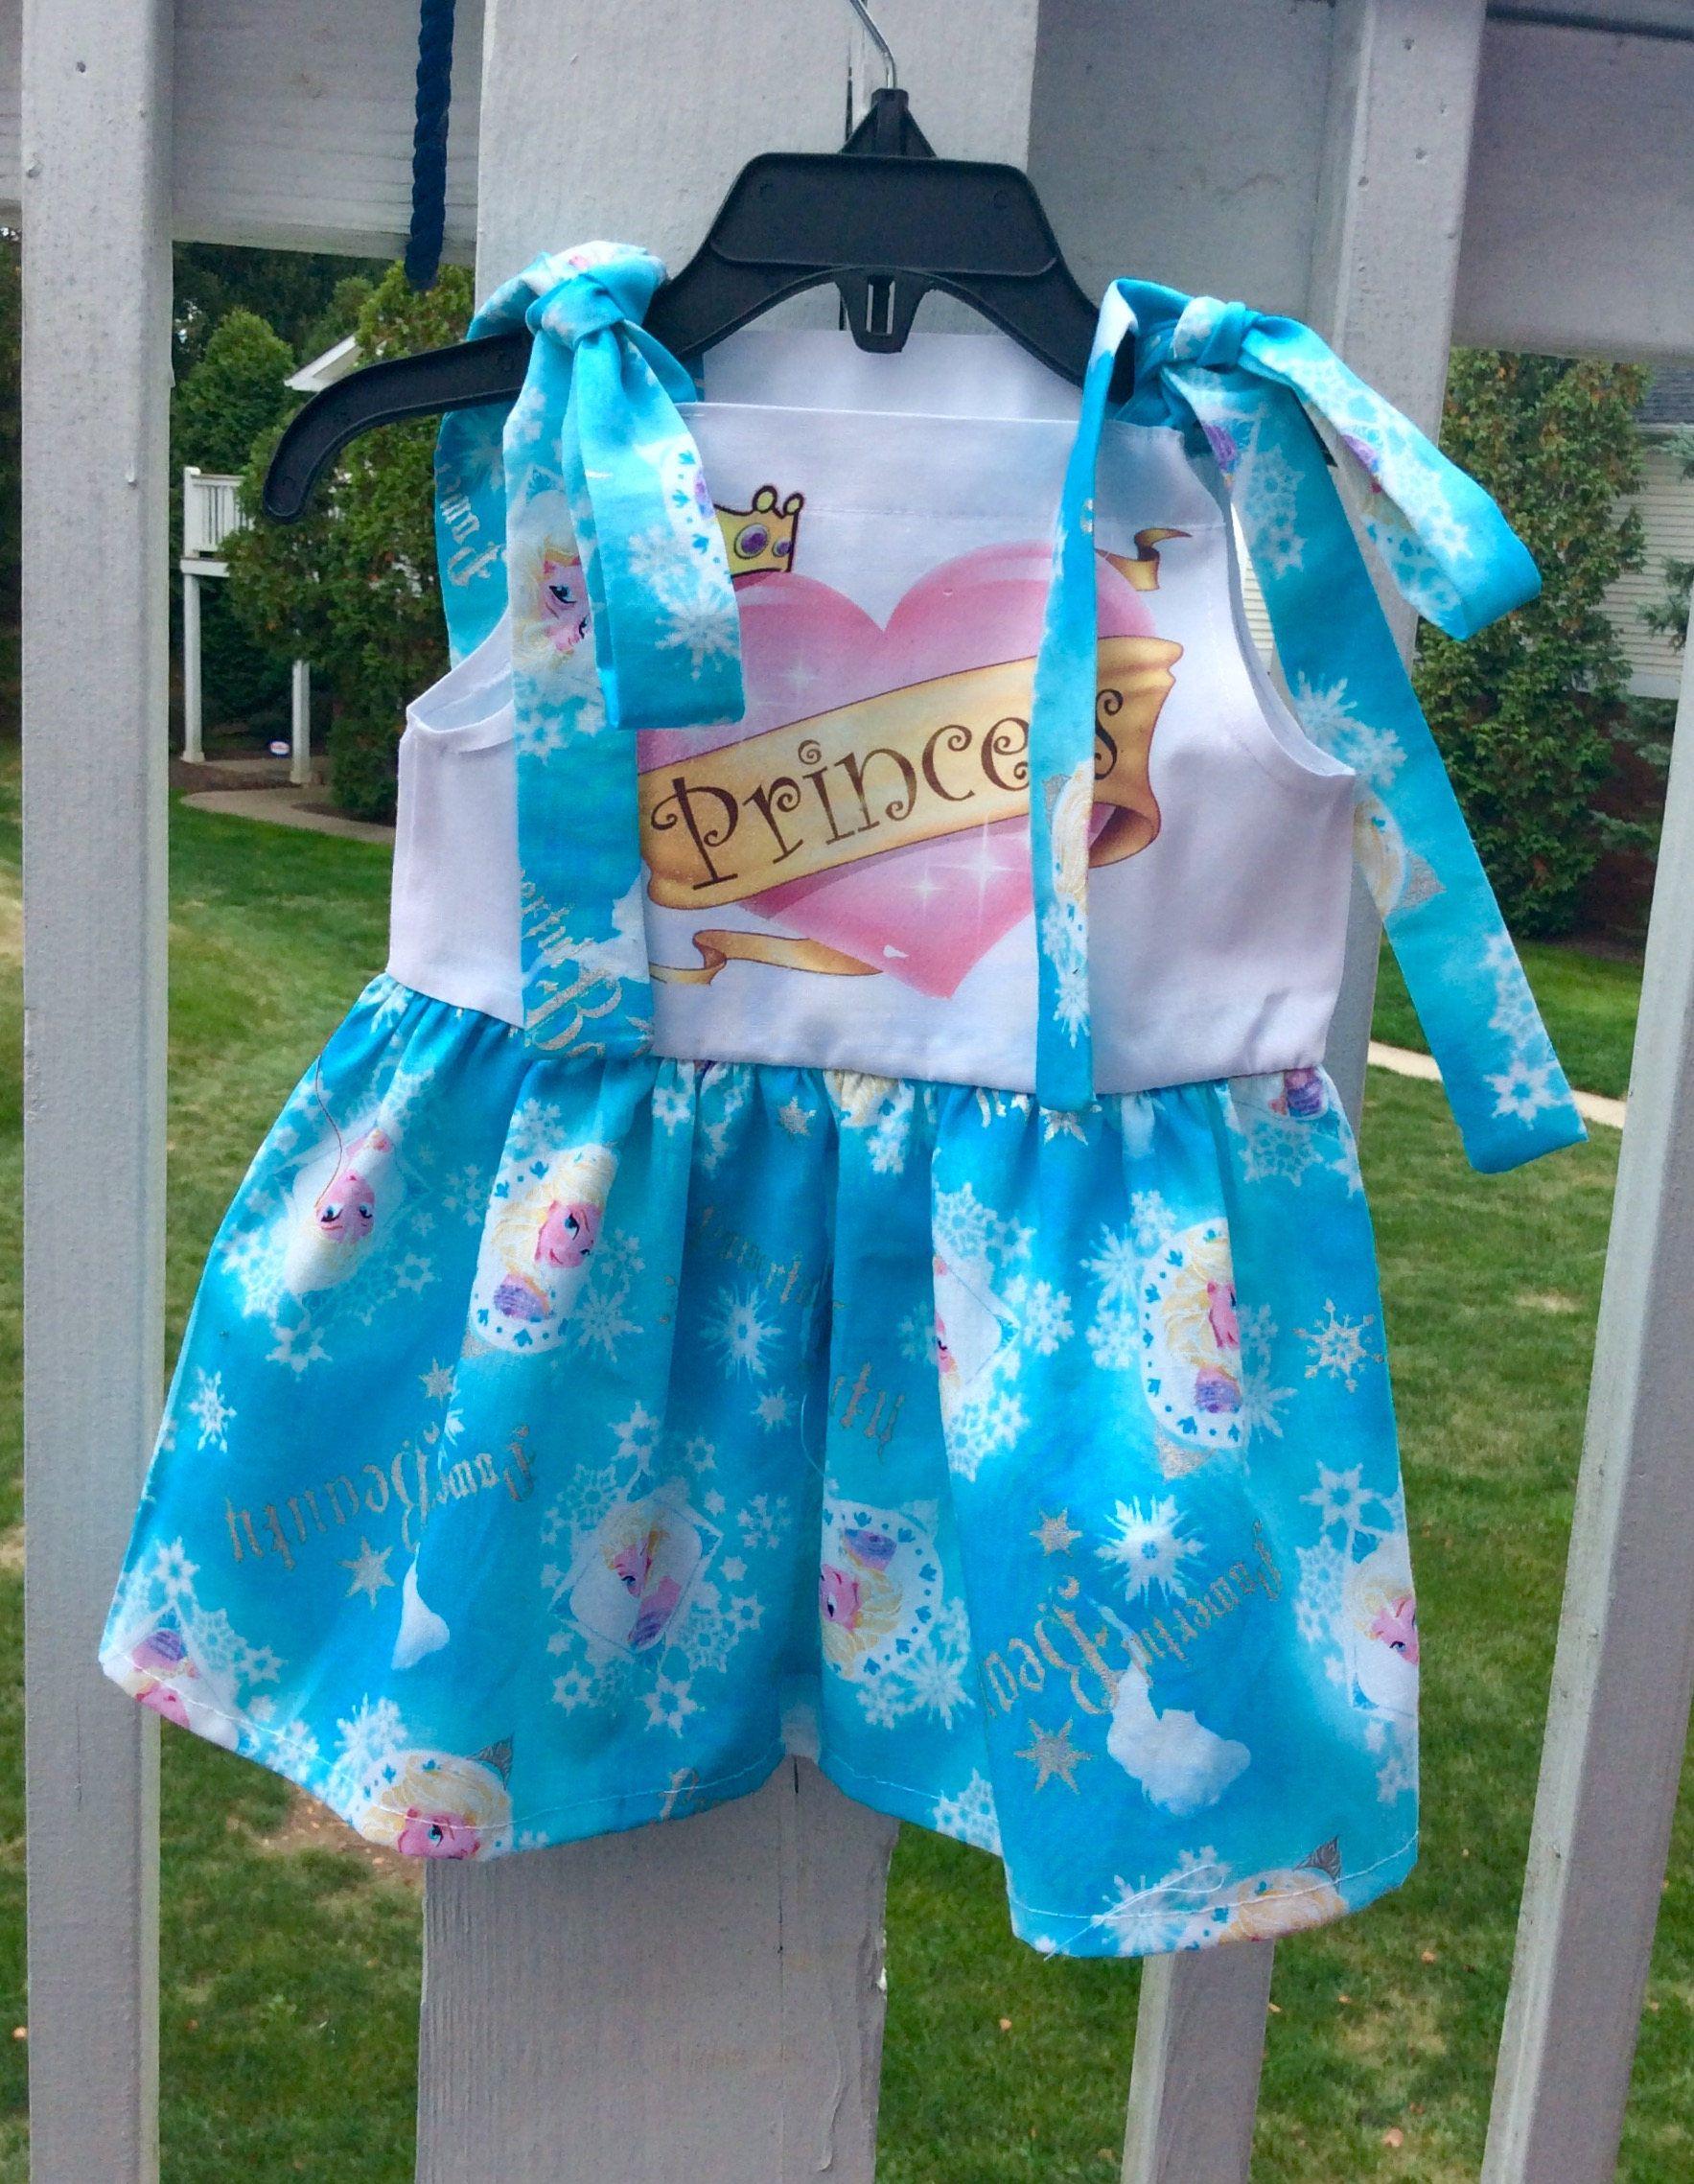 PRINCESS DESIGN DRESS, School dress, Princess dress, Party drss ...